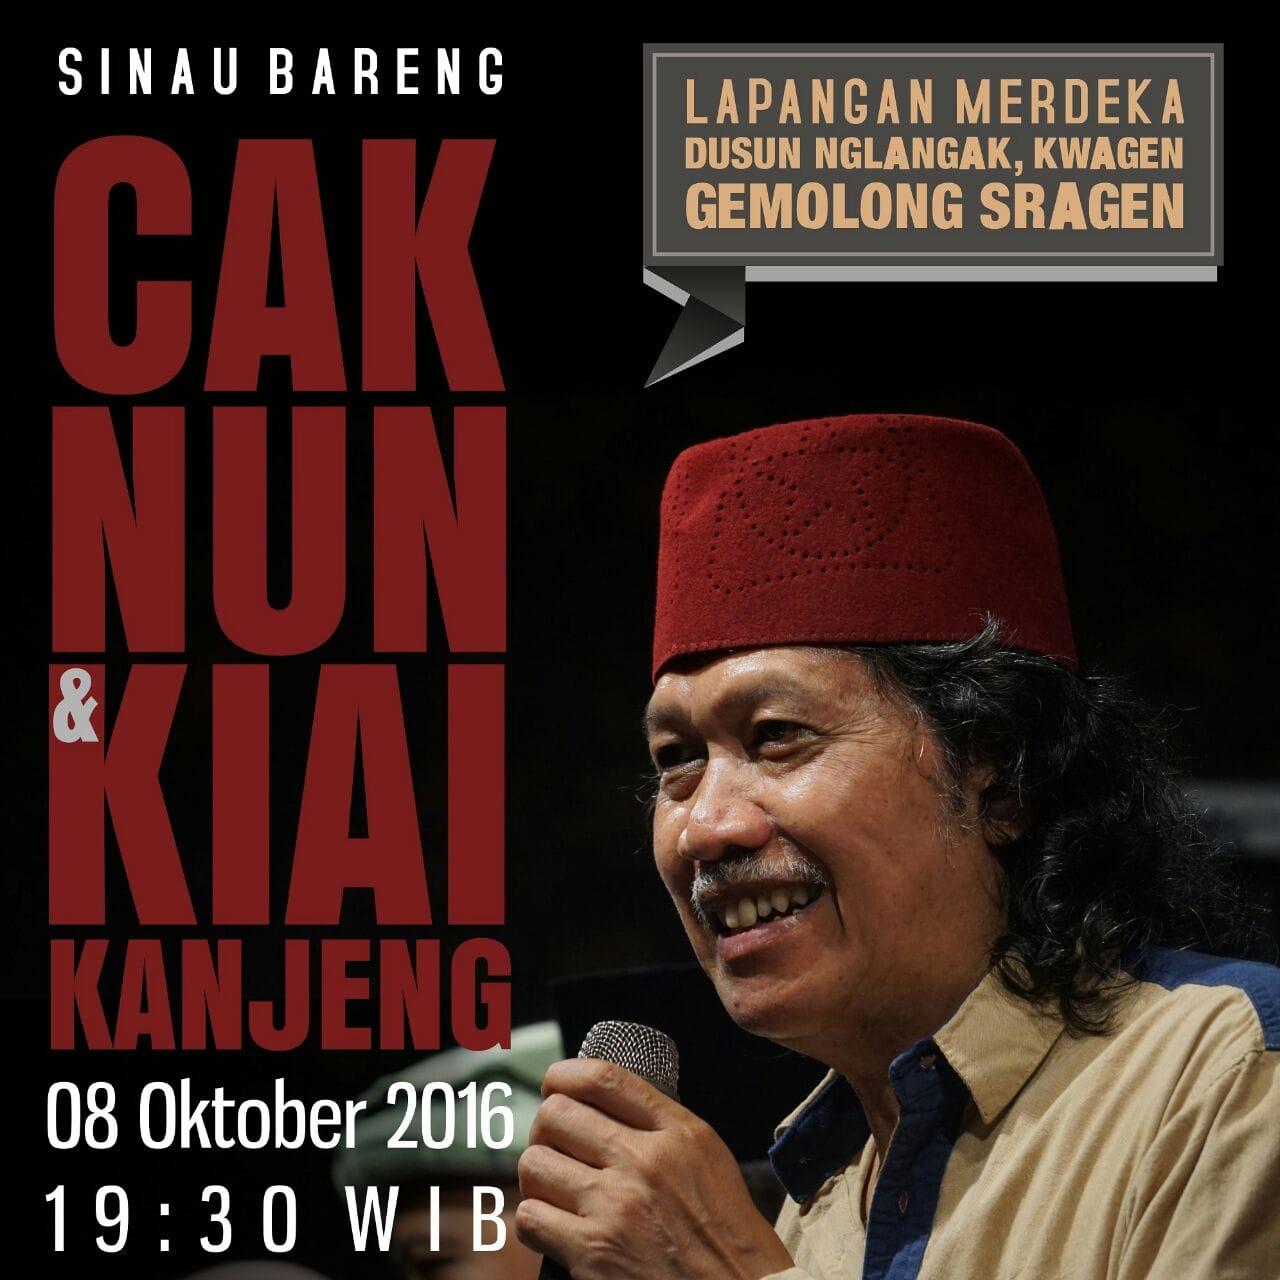 Sinau Bareng Cak Nun KiaiKanjeng, Gemolong, Sragen, 08 Oktober 2016